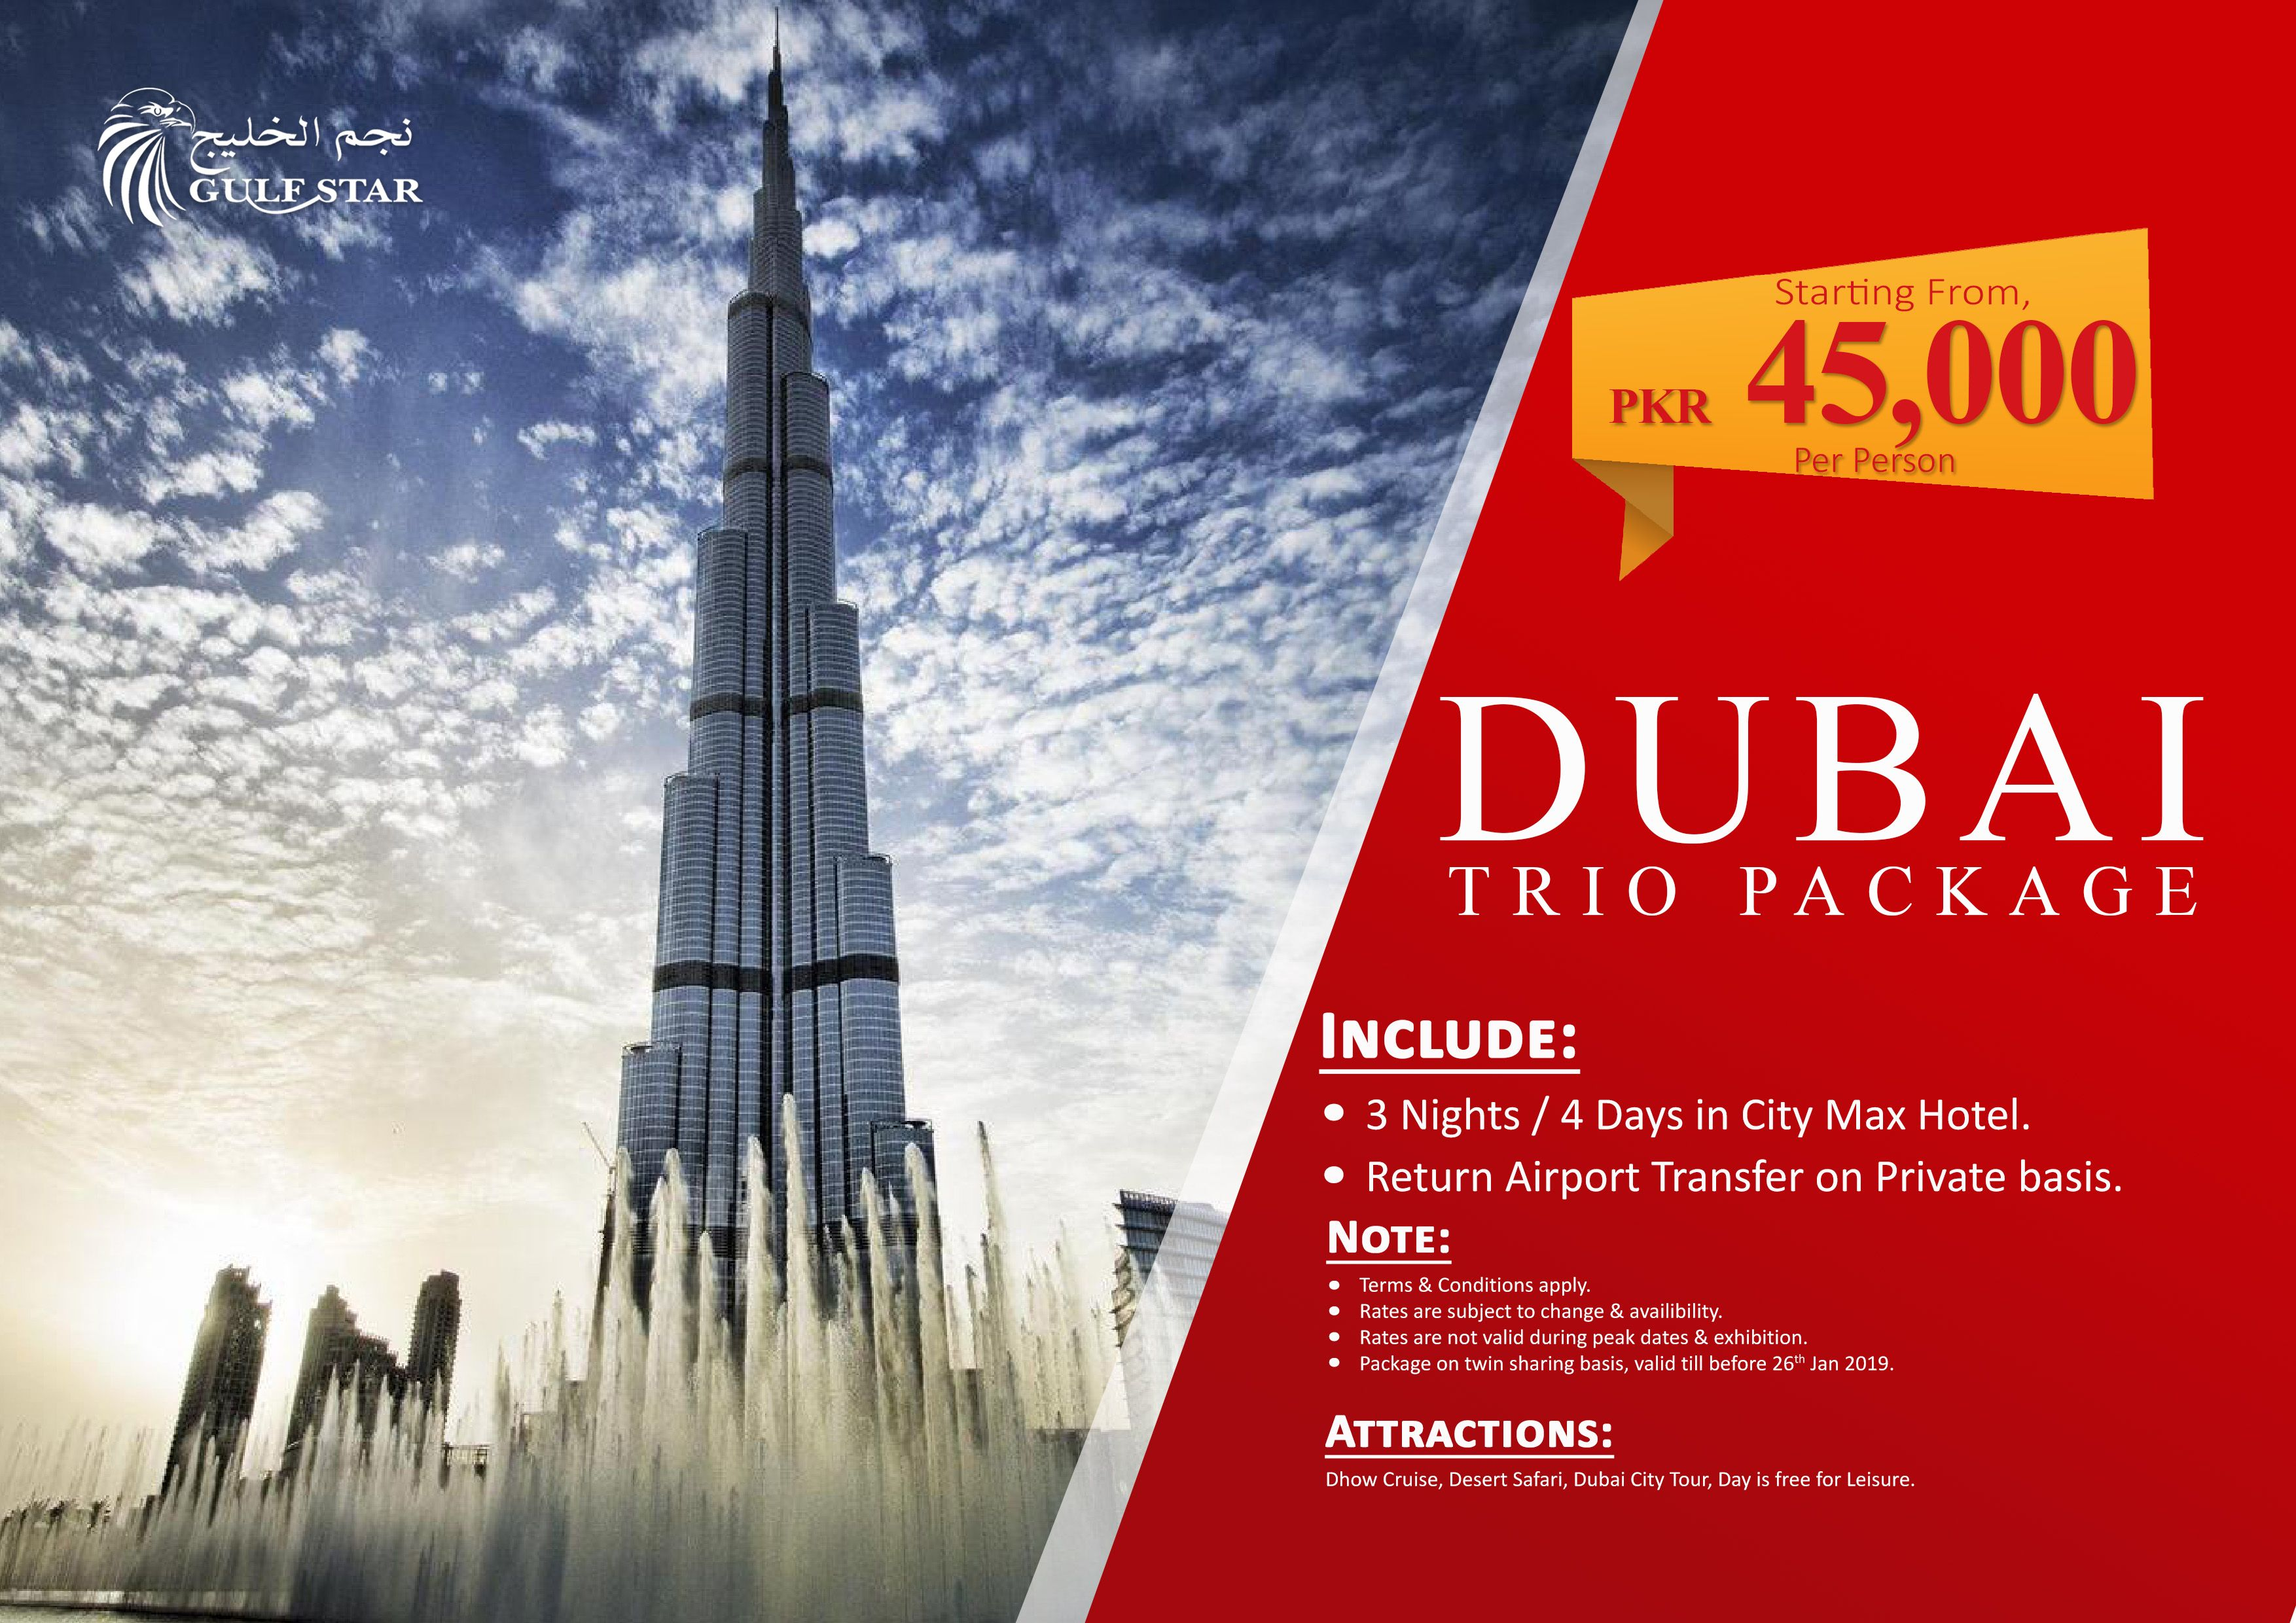 Dubai Trio Package*** In Just